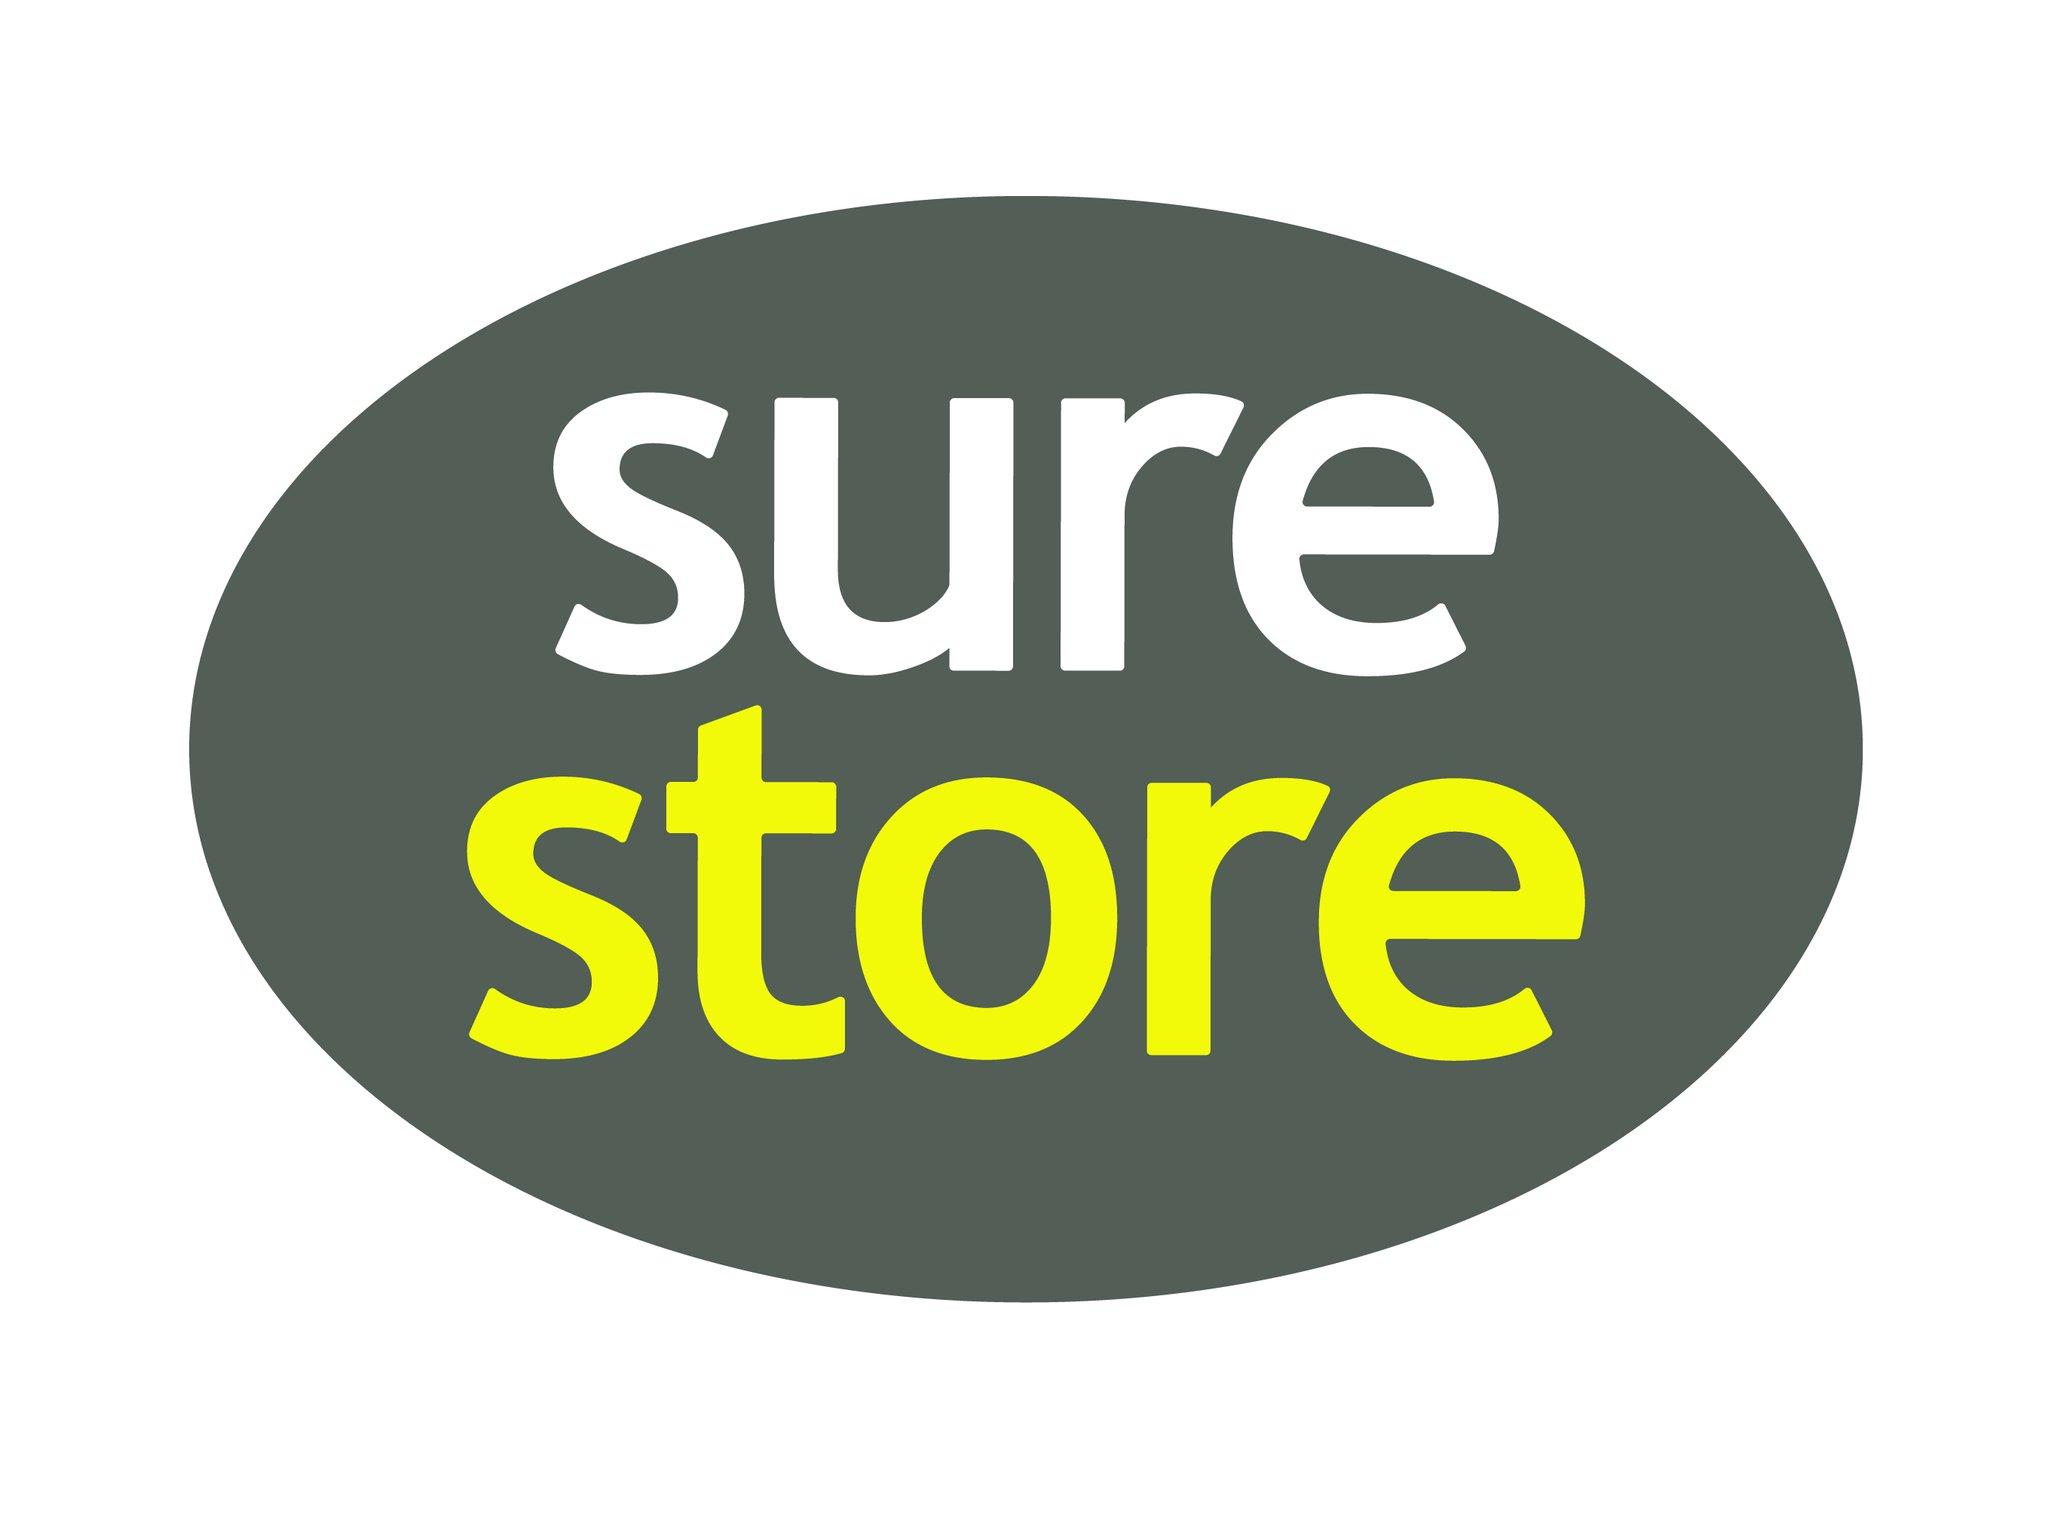 Sure Store